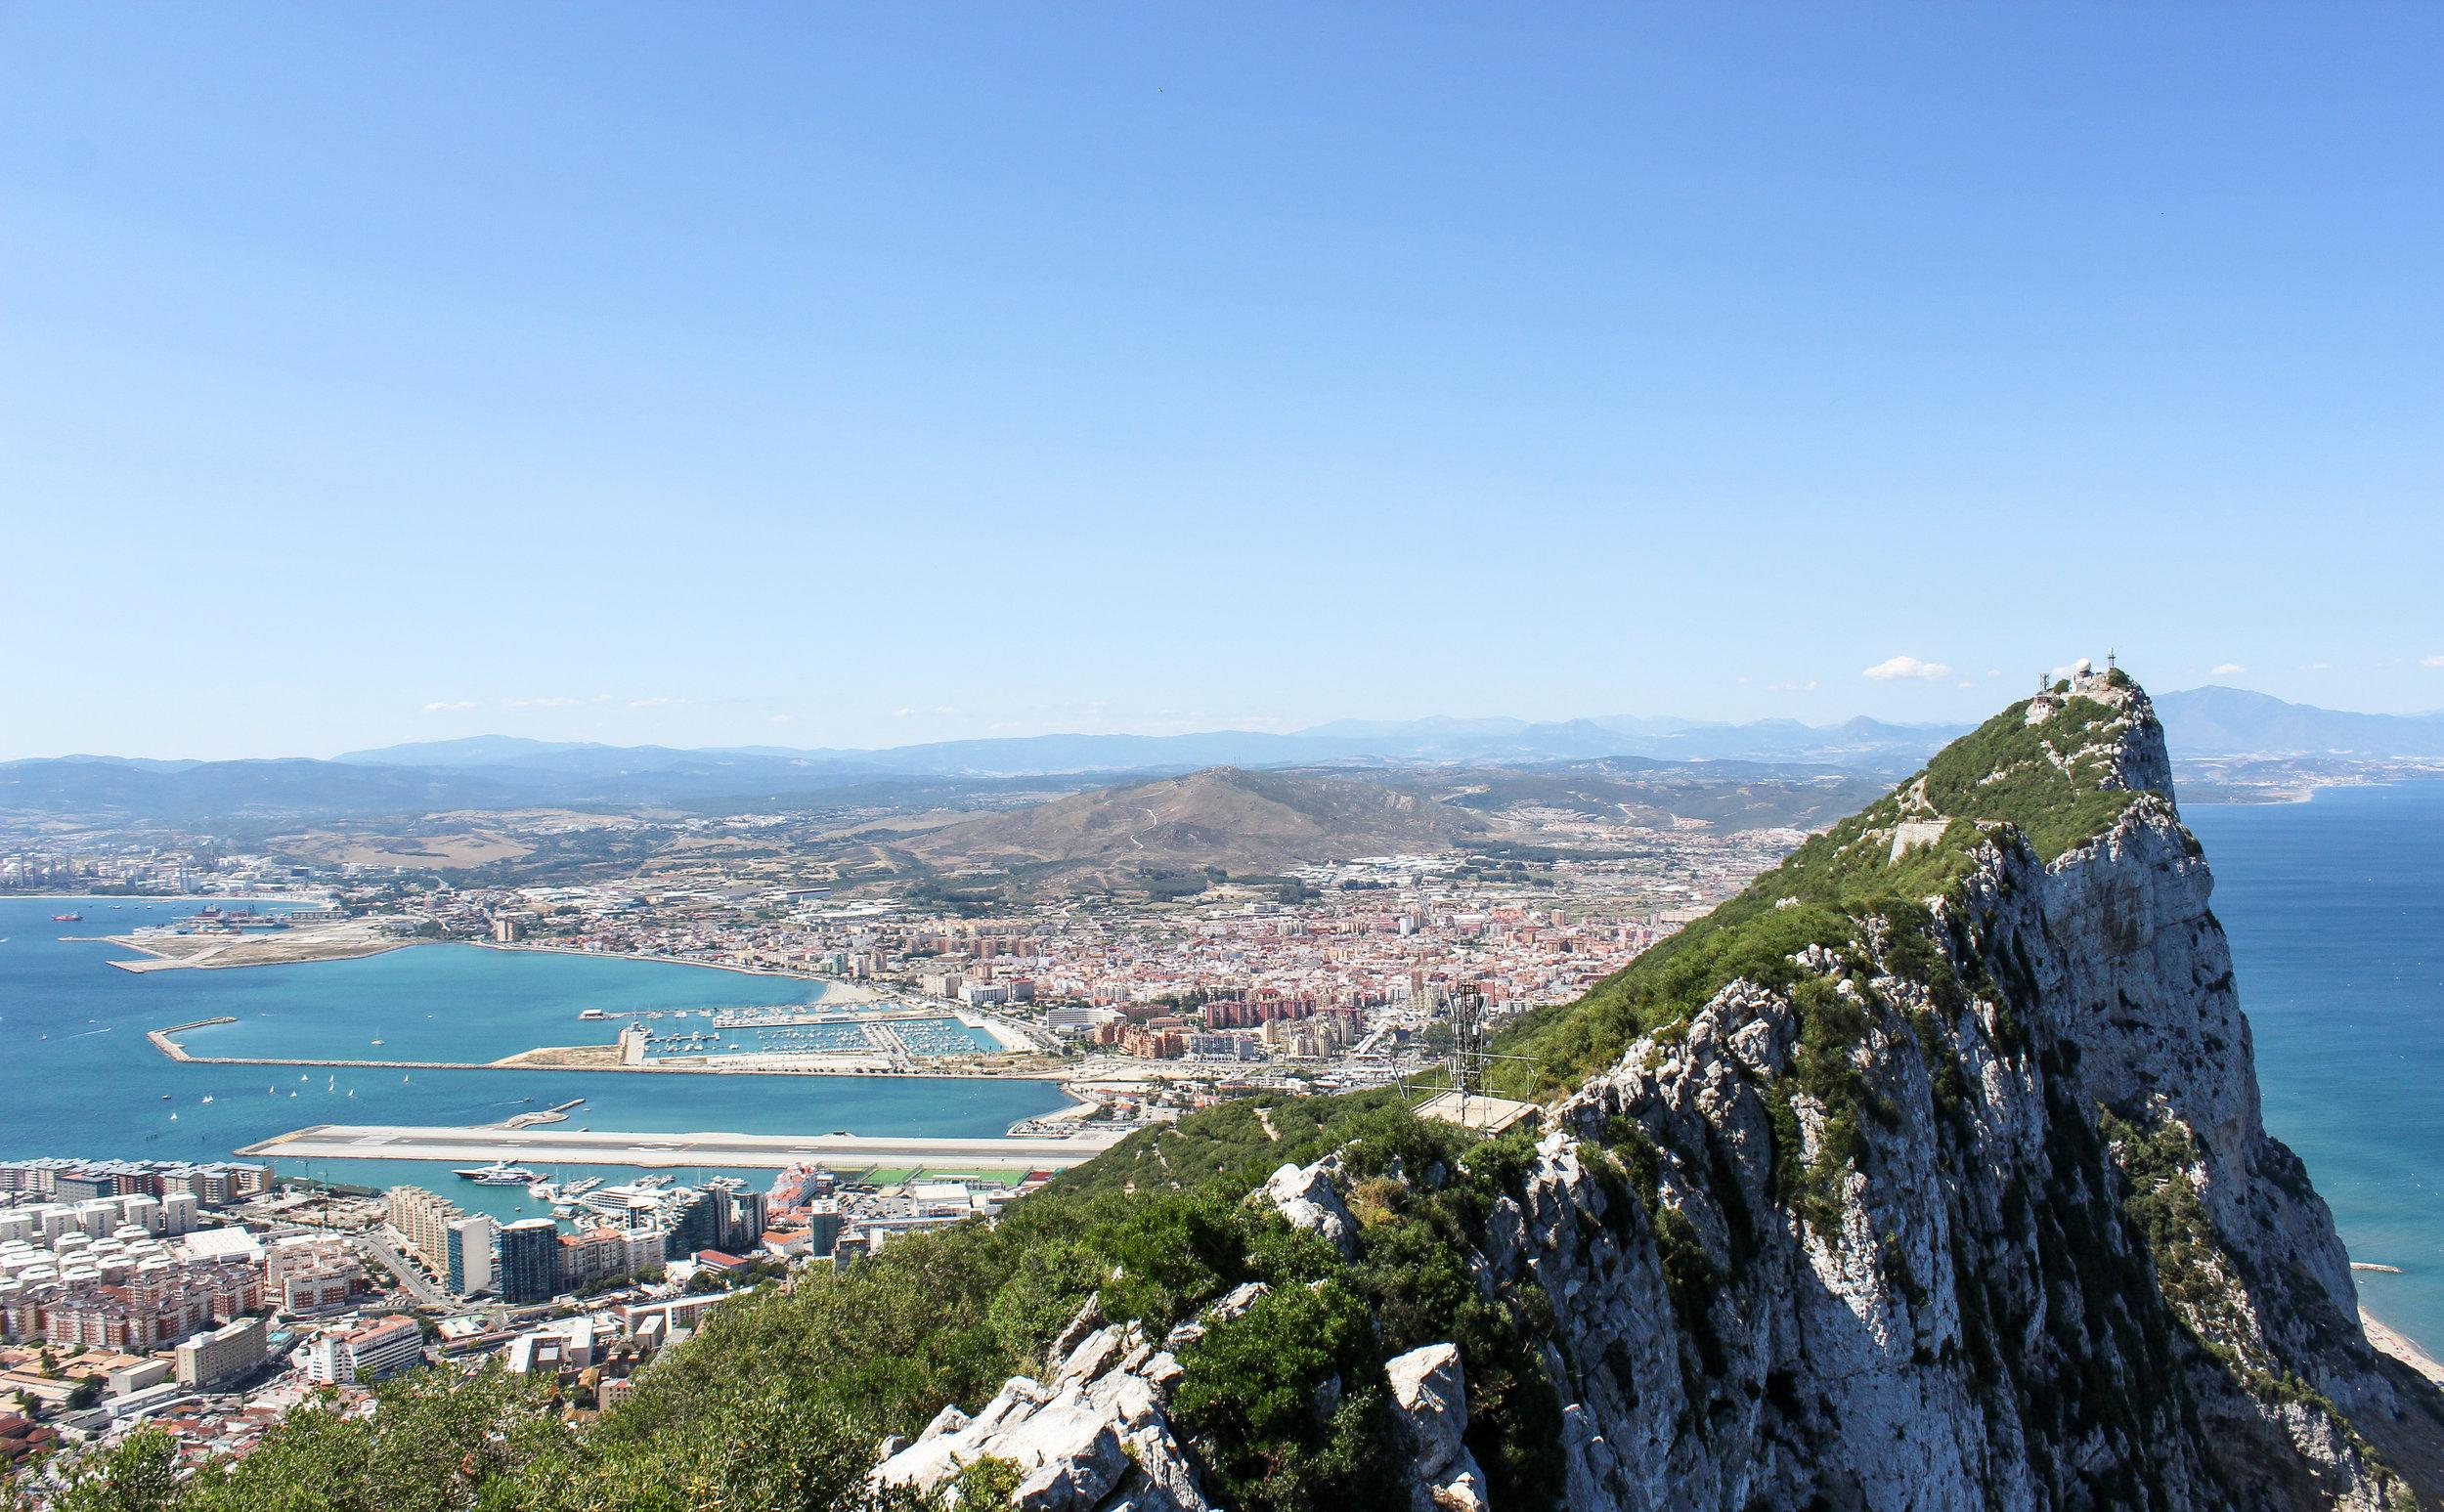 Upper Rock Nature Reserve, Straits of Gibraltar, Gibraltar Bay, Mediterranean, Gibraltar, British Overseas Territory, La Linea de la Concepcion, Spain, Europe | www.DoLessGetMoreDone.com |